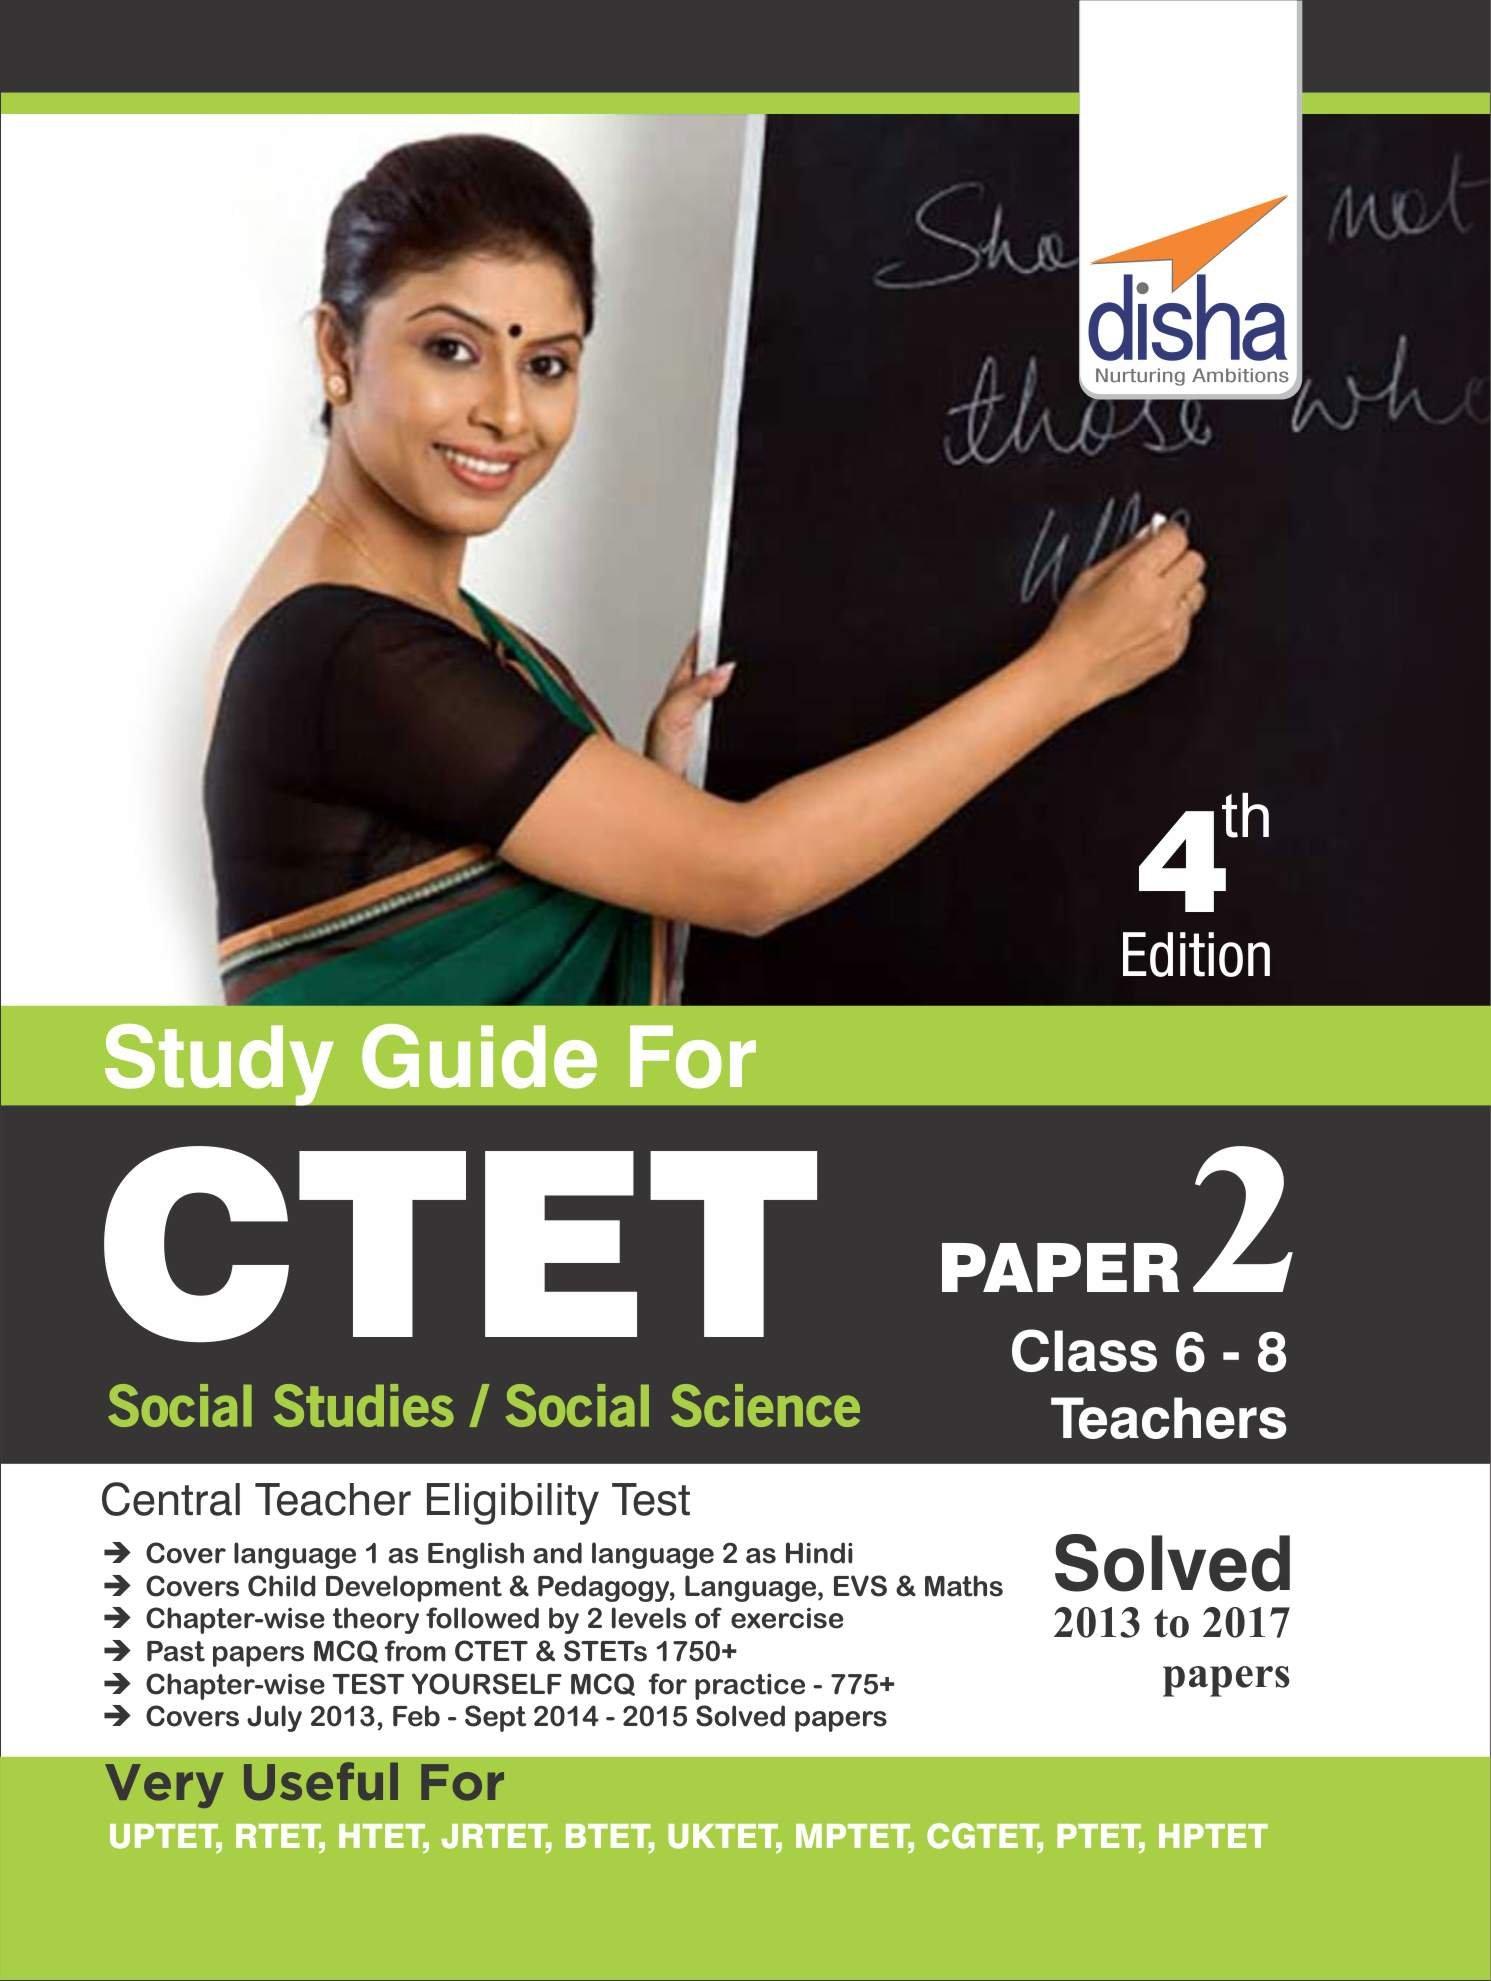 Buy Study Guide for CTET Paper 2 (Class 6 - 8 Teachers